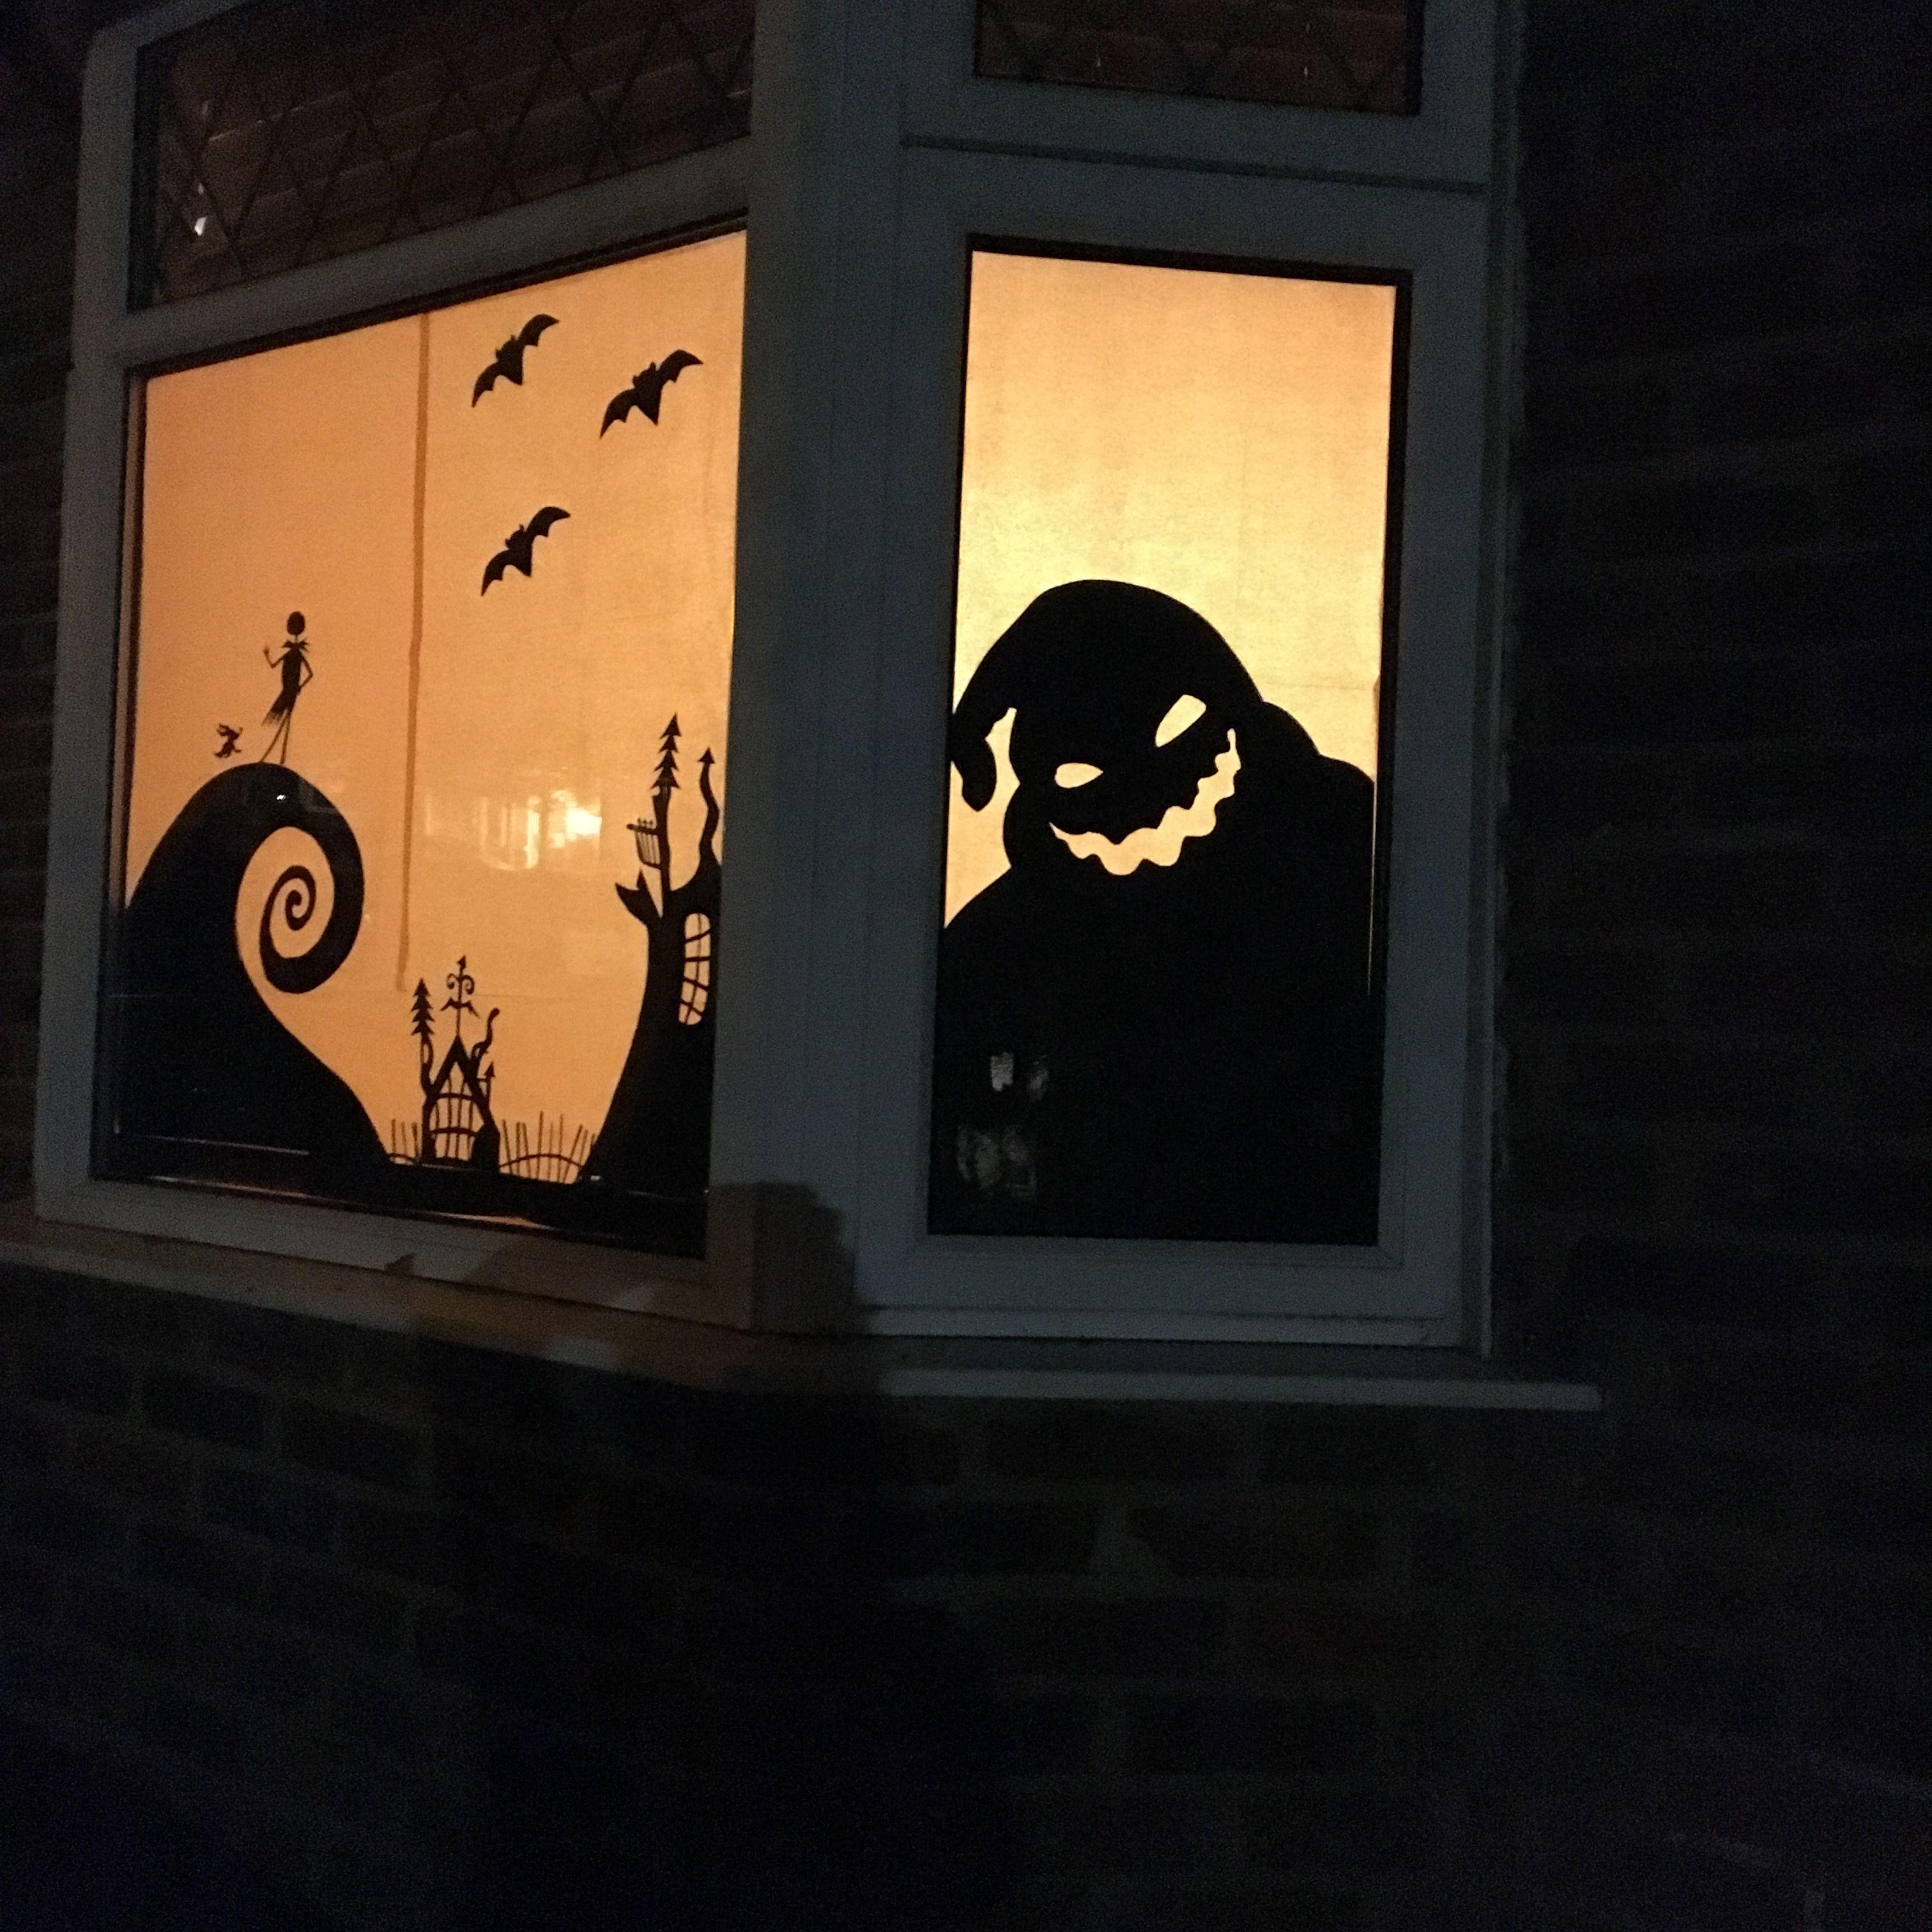 Oogie boogie. Nightmare before Christmas. Halloween window